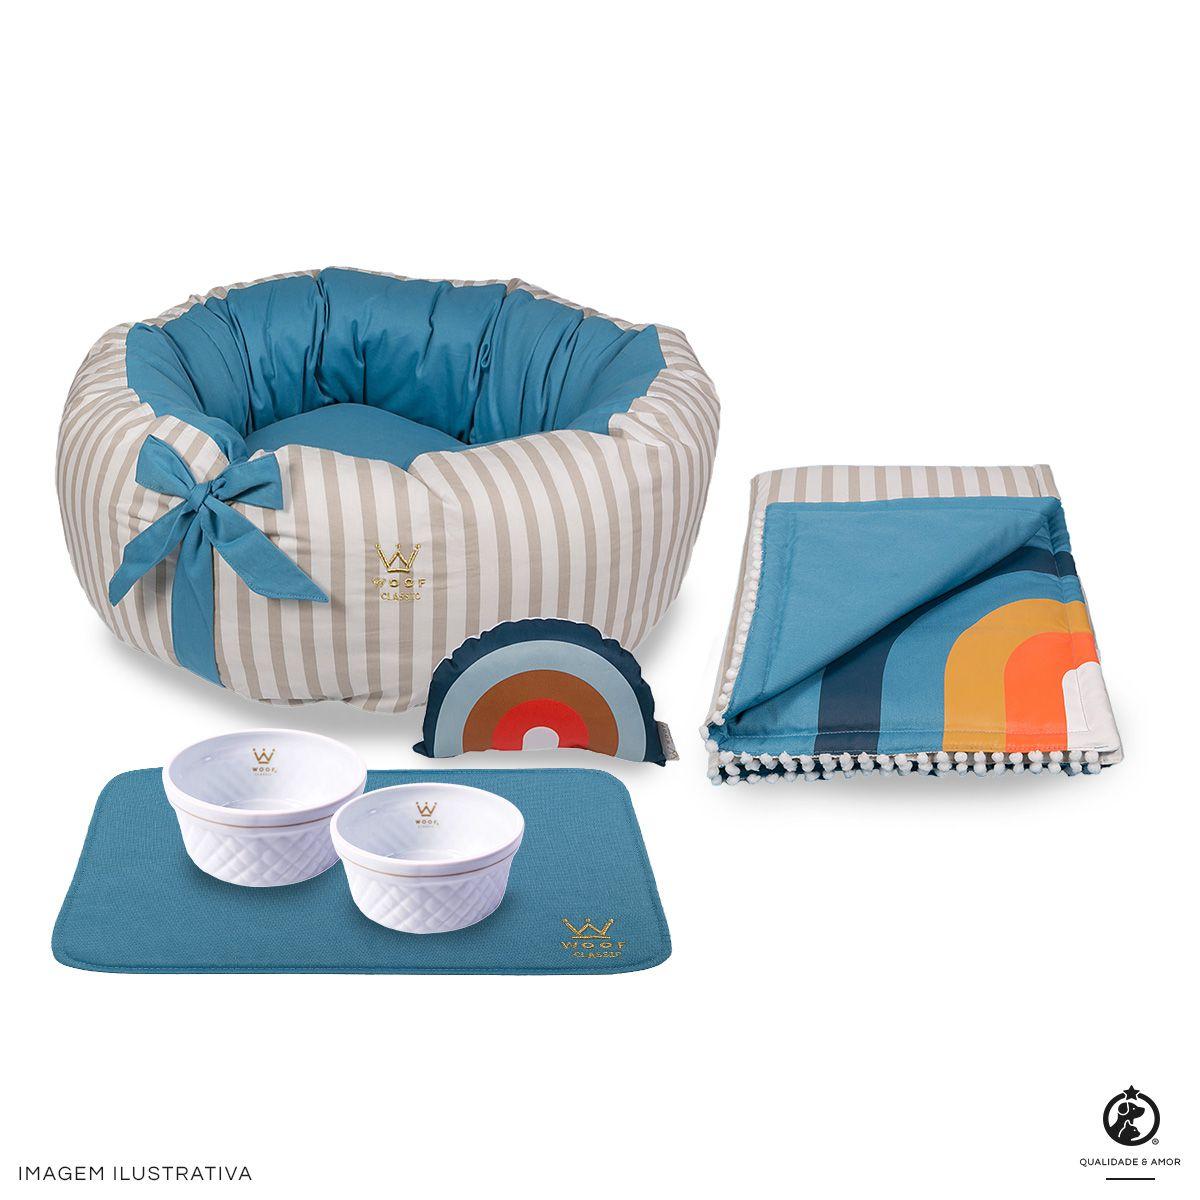 Kit Fofinha Azul Sweet Dreams Woof: Cama + Tigelas + Edredom + Jogo Americano